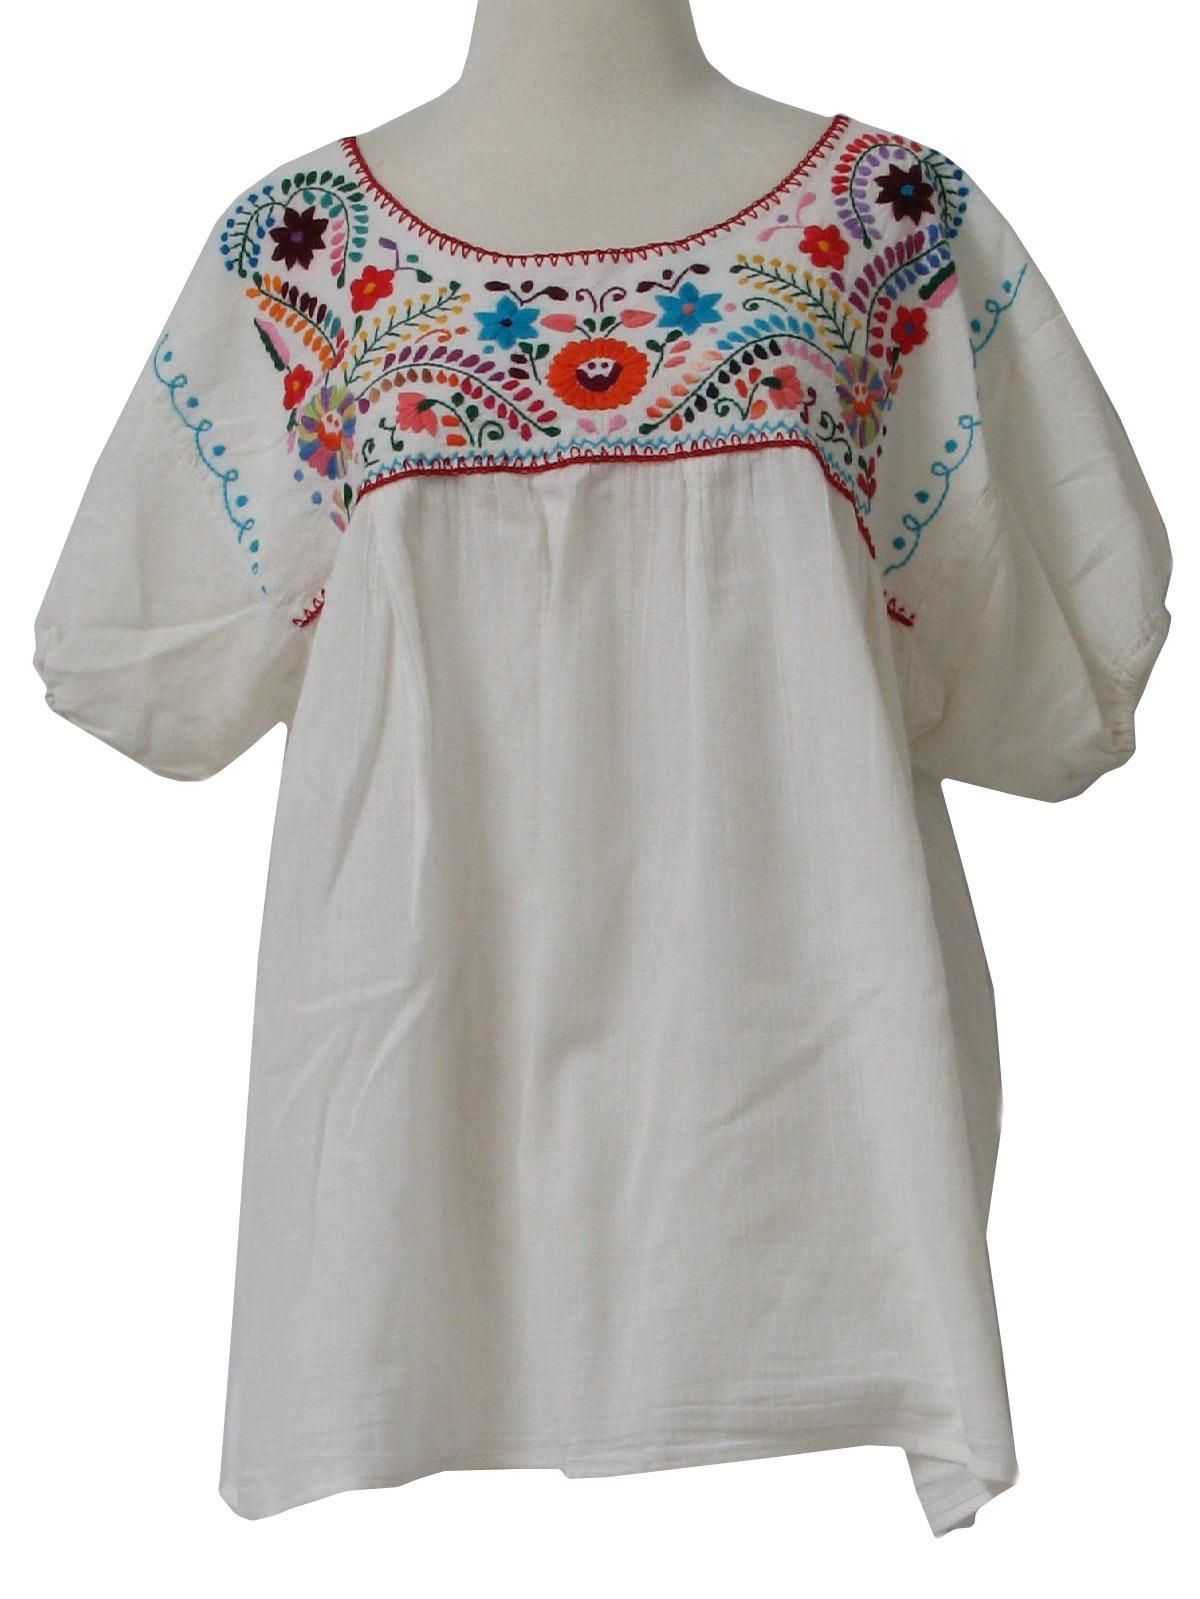 688fa827fd9 Retro 70s Hippie Shirt (Mexican Blouse)   70s -Mexican Blouse ...